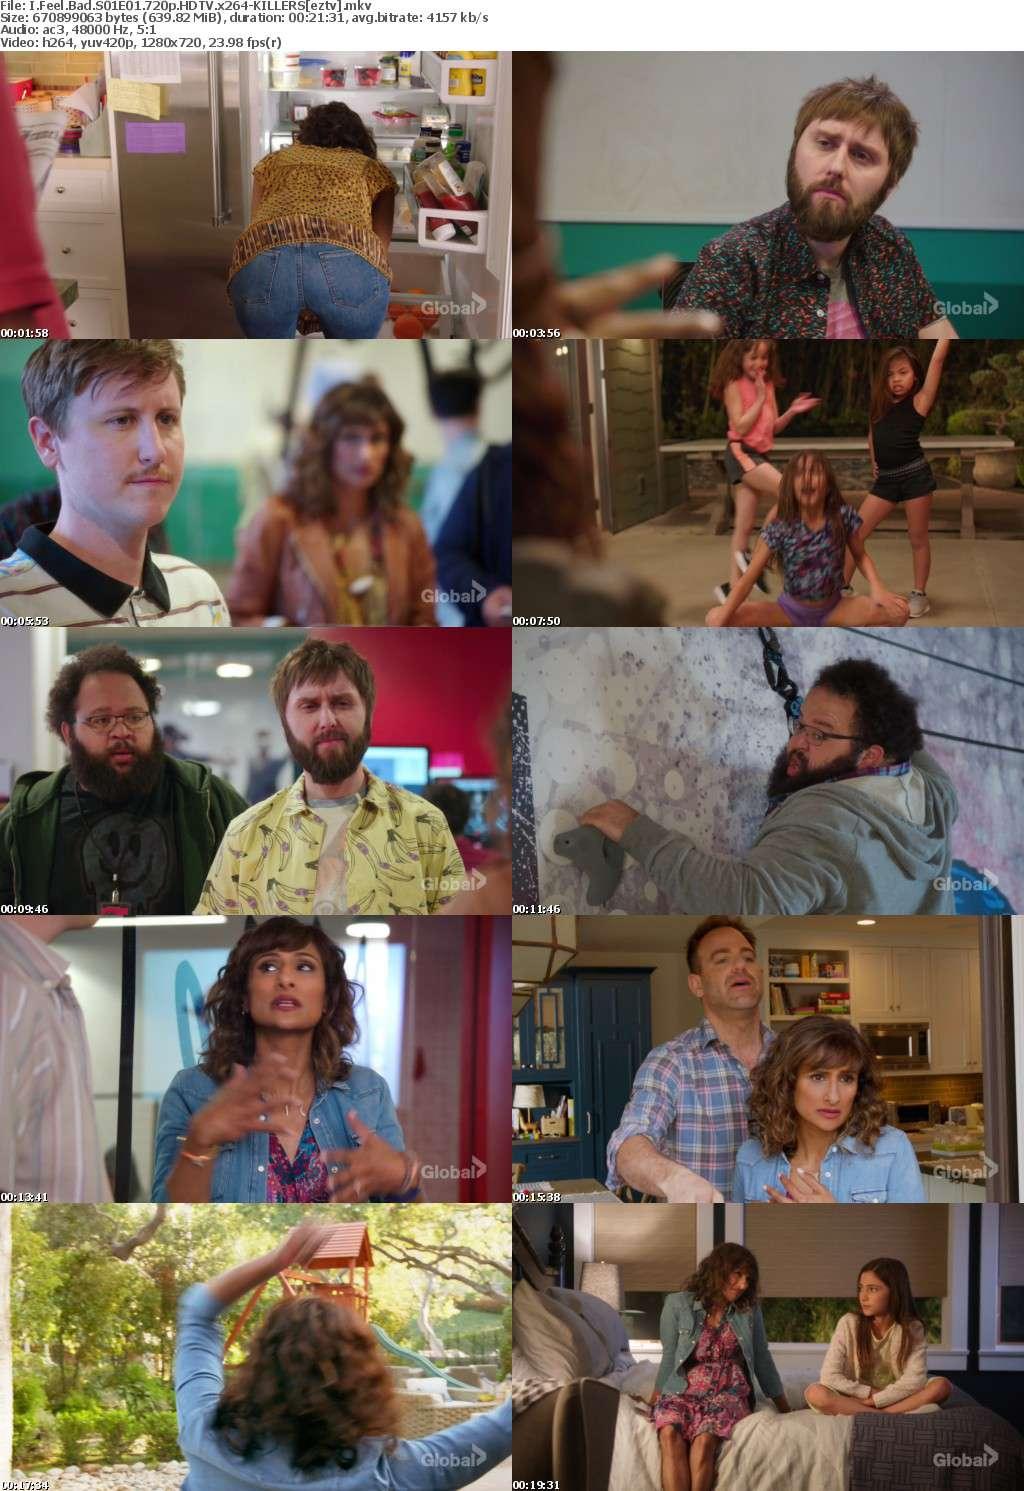 I Feel Bad S01E01 720p HDTV x264-KILLERS